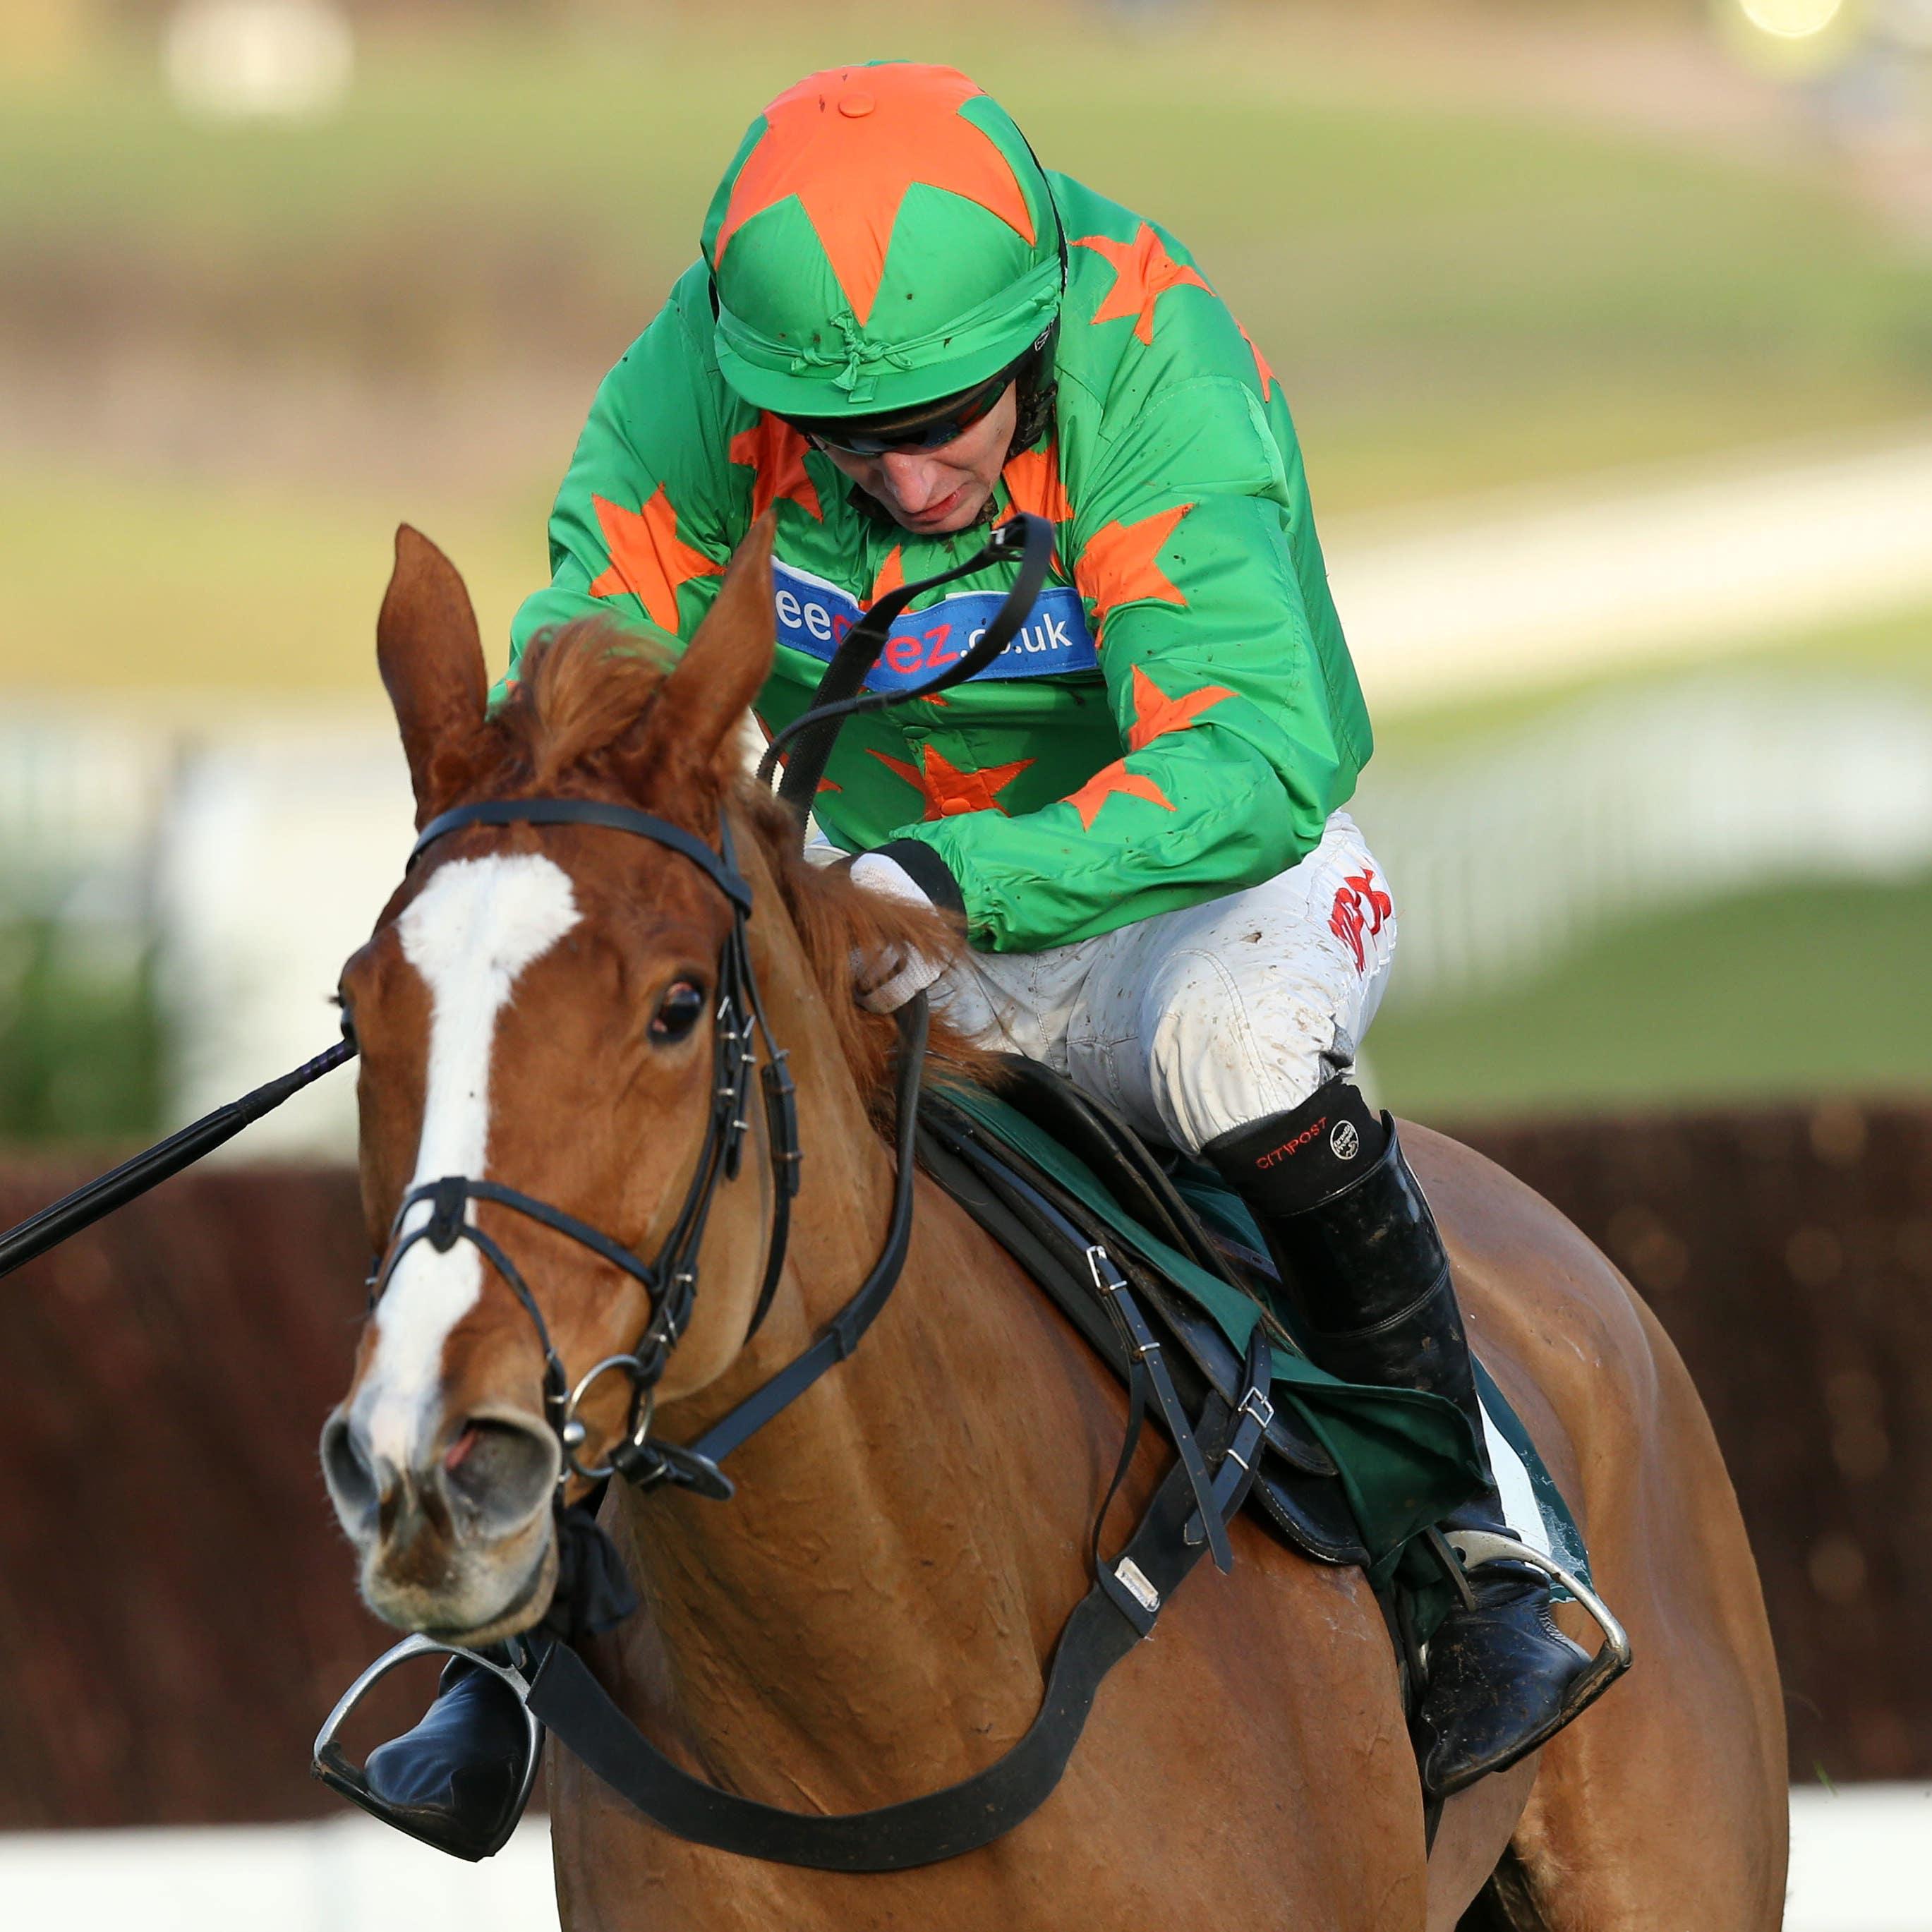 Ms Parfois on her way to winning at Cheltenham